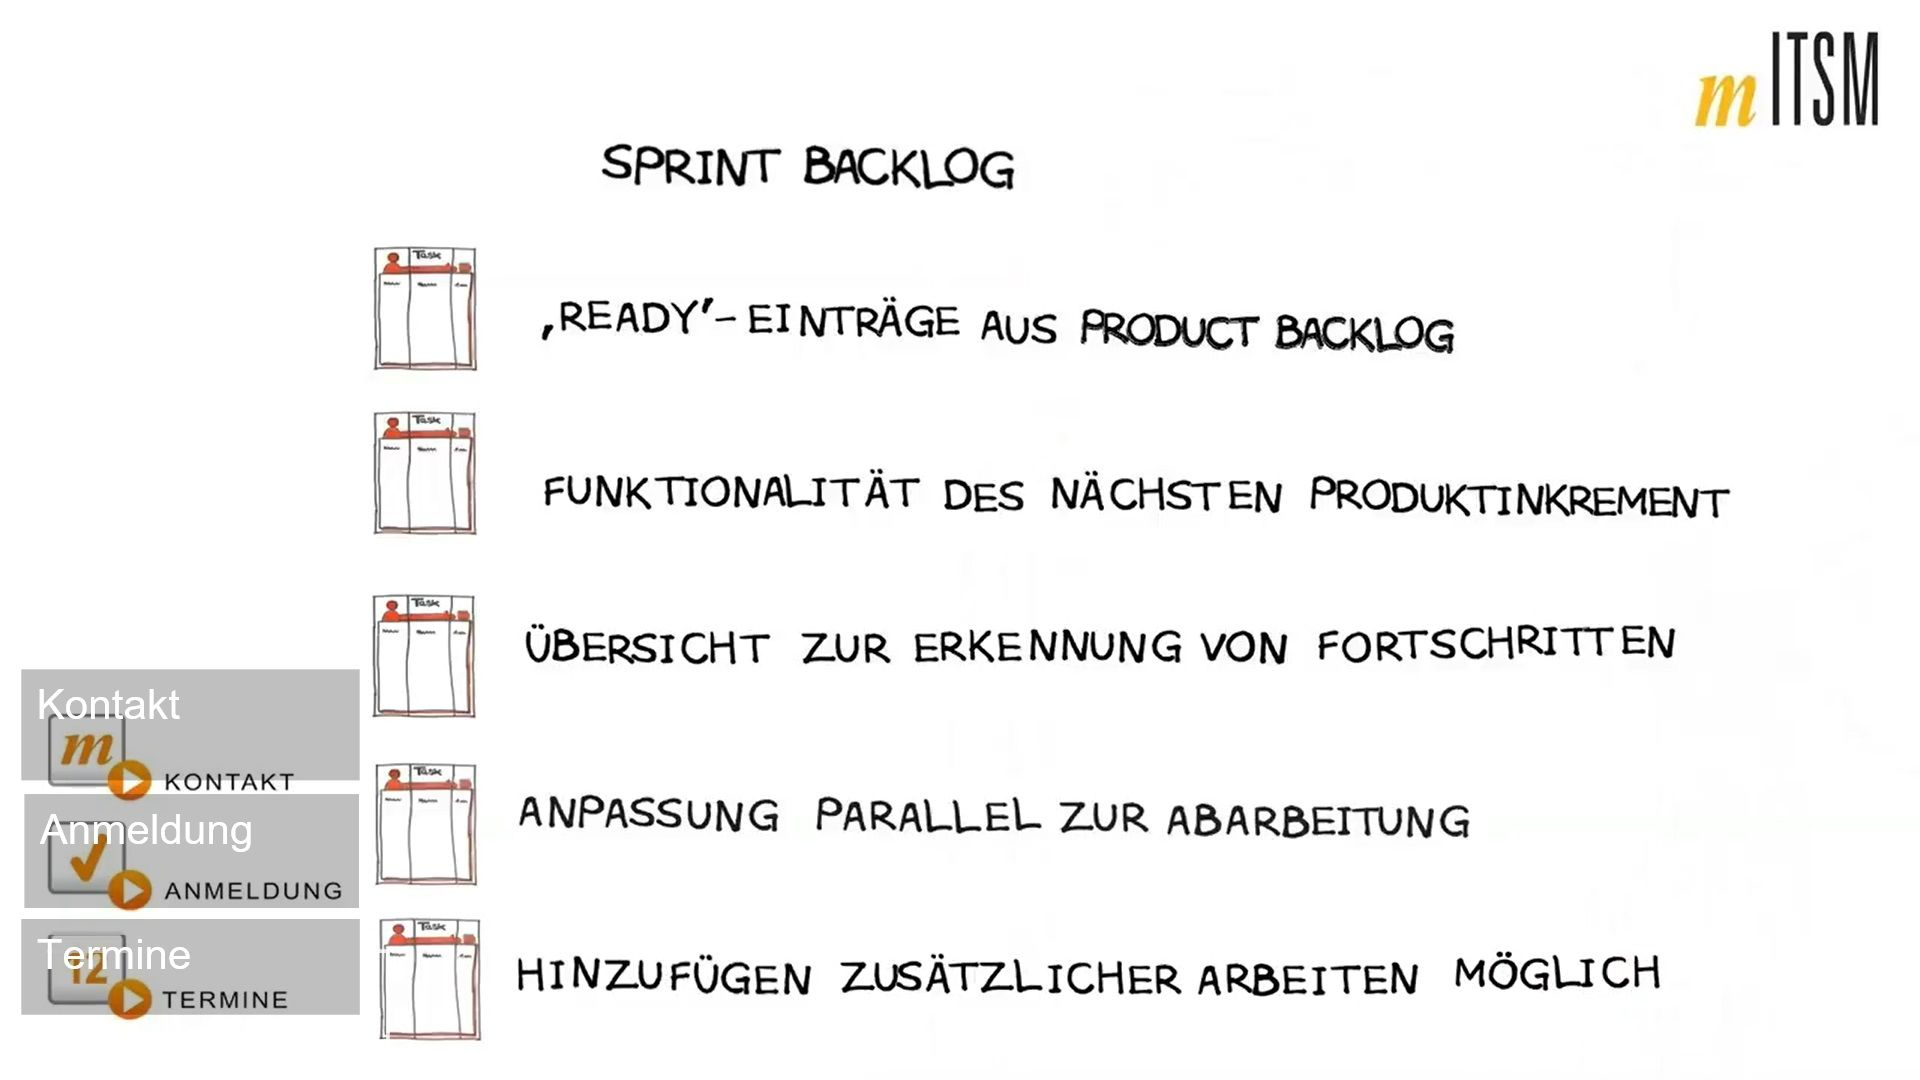 8. SCRUM - Das Sprint Backlog 2 | #project management | Pinterest ...